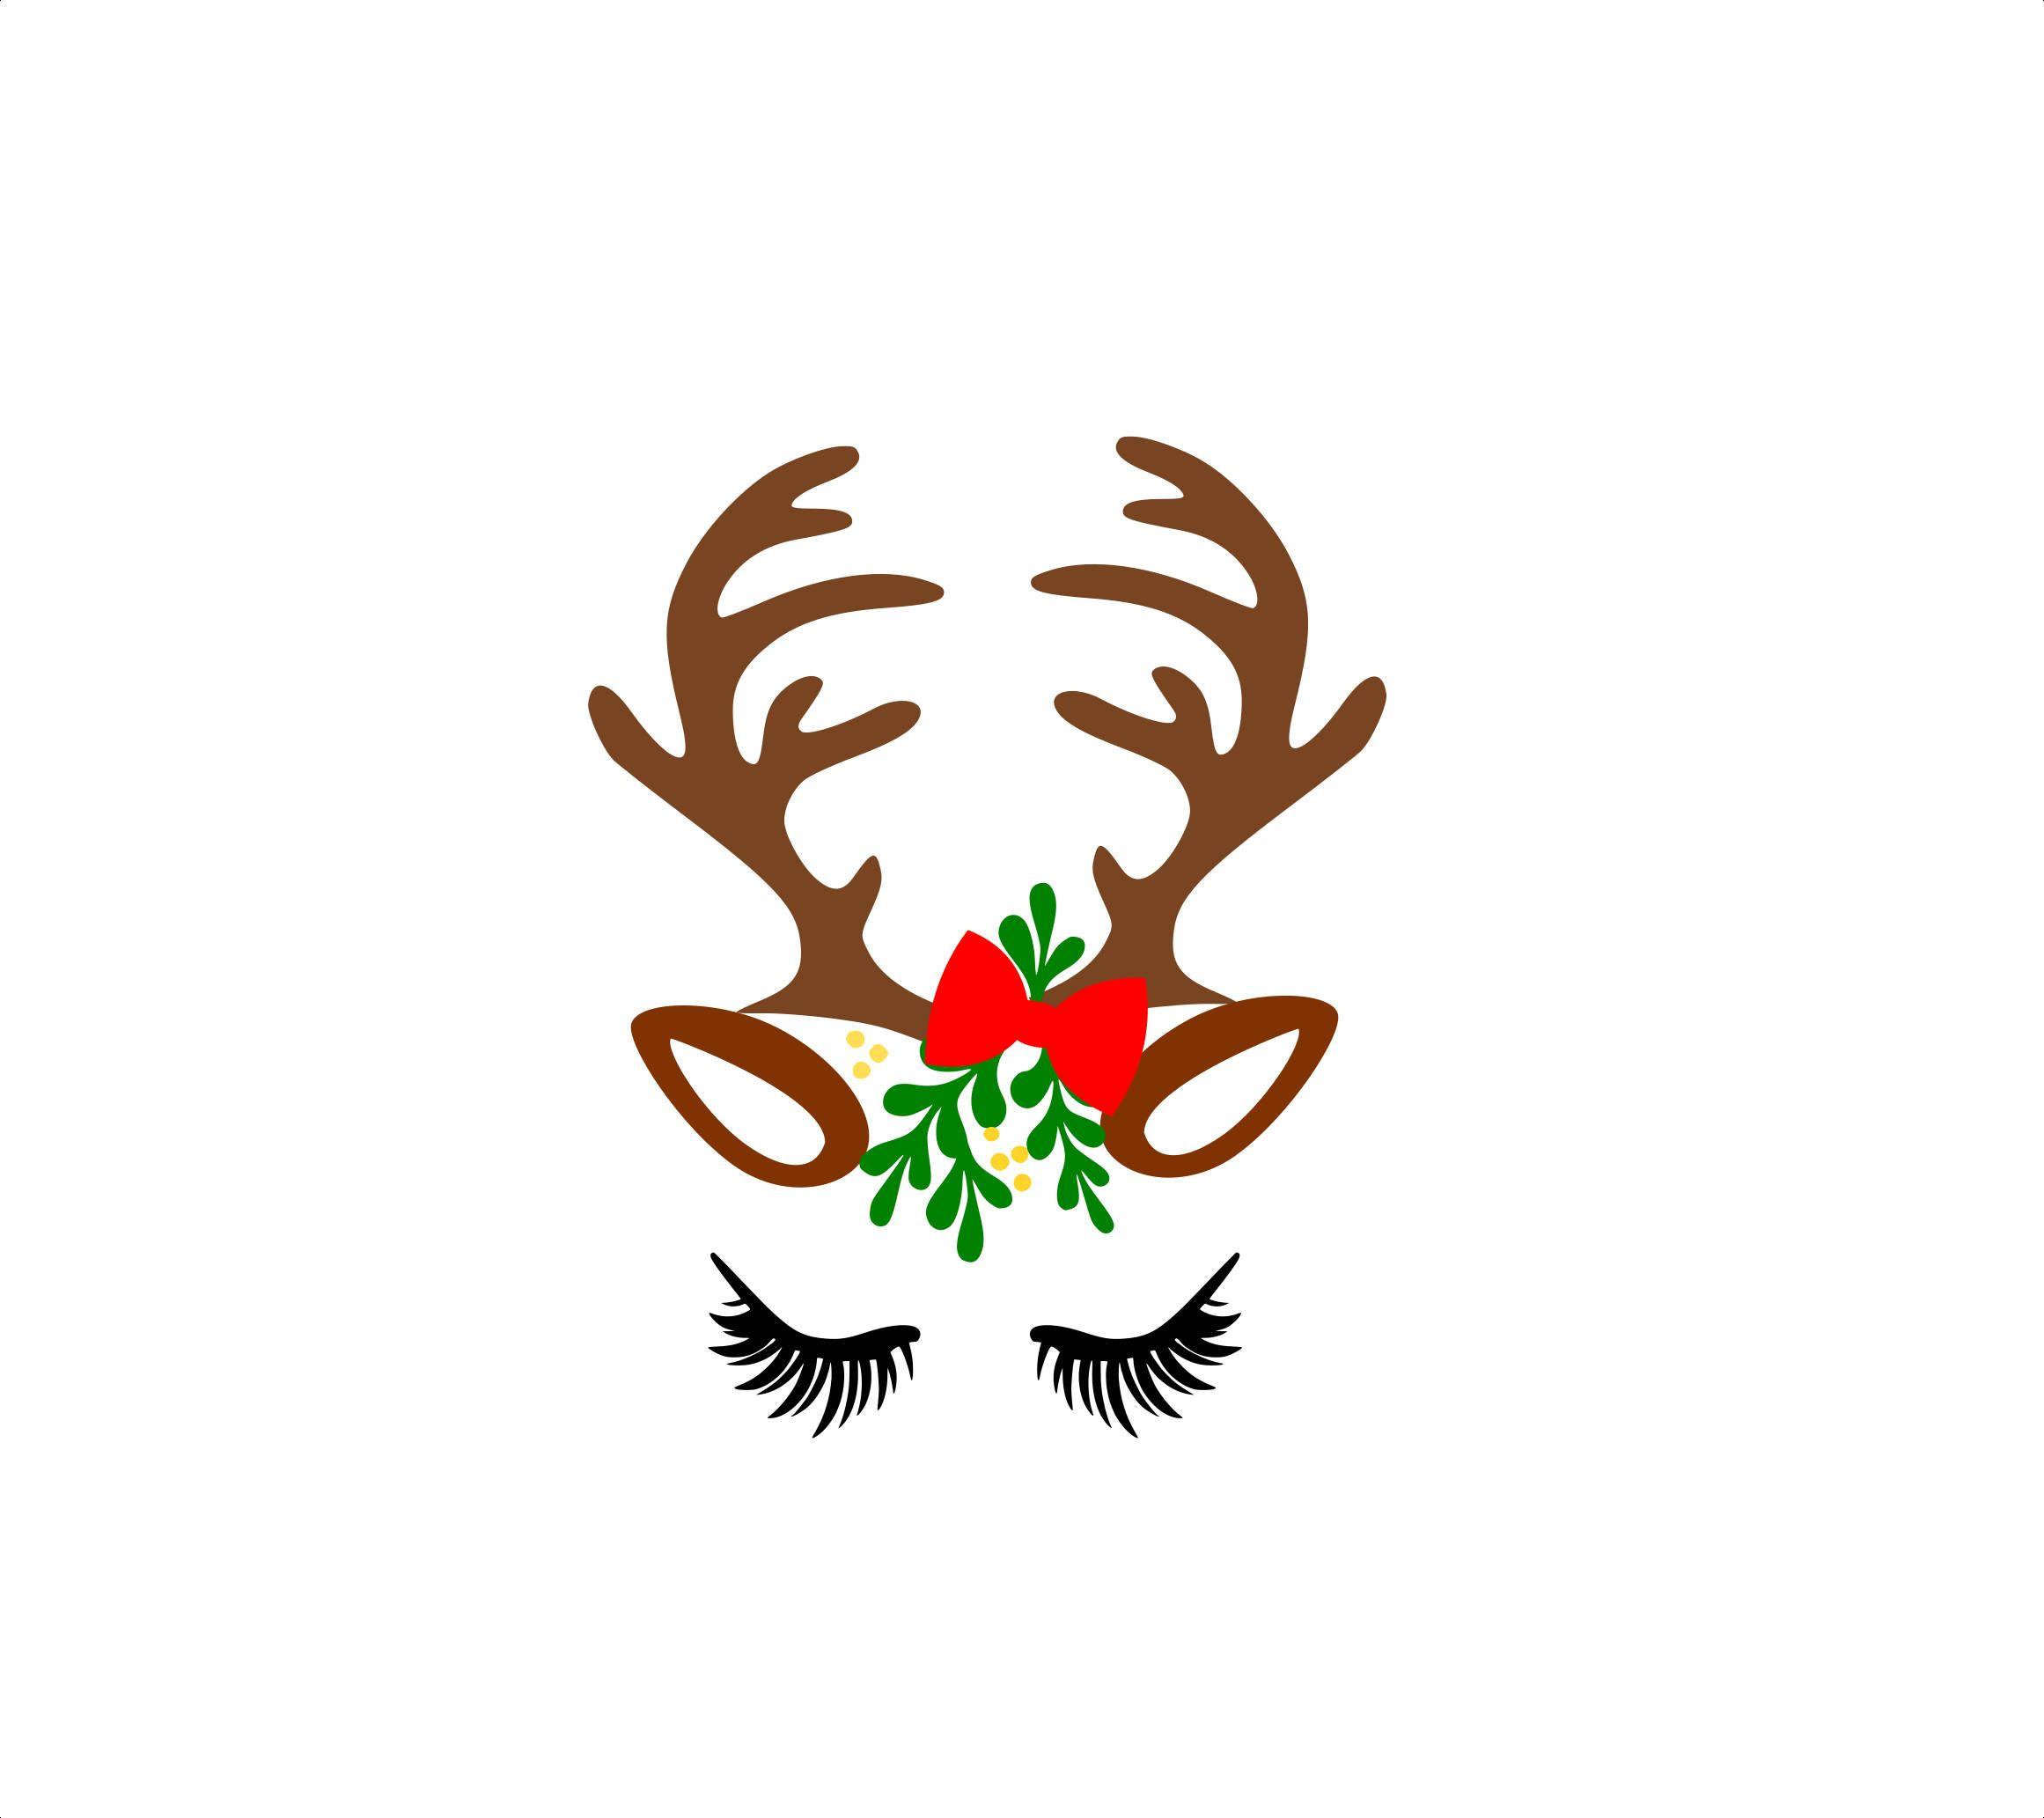 Reindeer face svg, Reindeer svg files, Christmas reindeer.